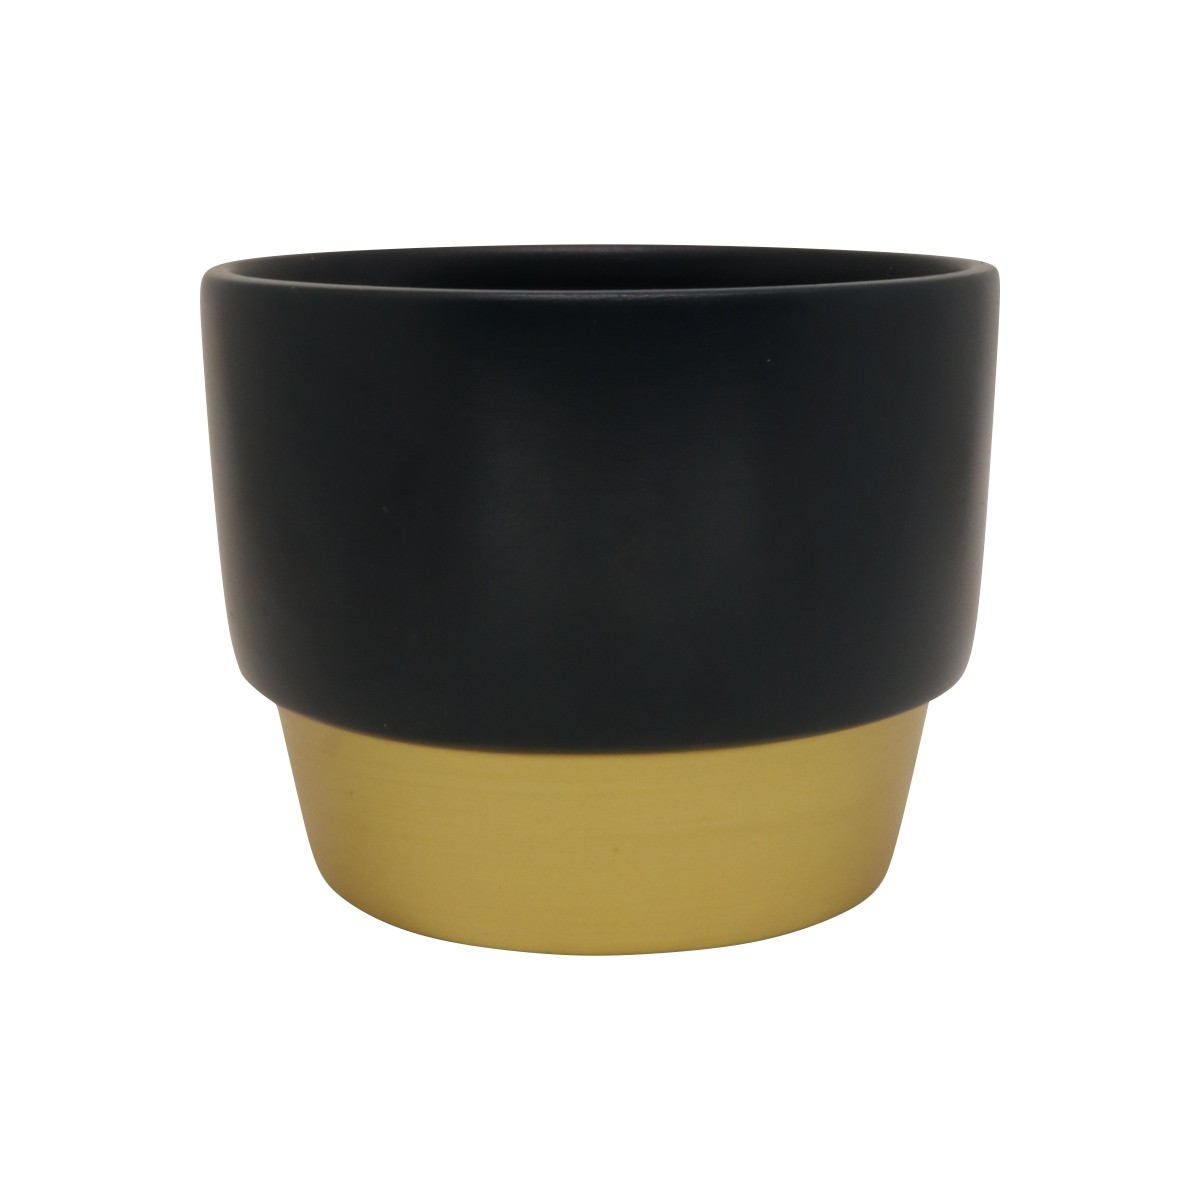 Vaso de Cerâmica para Suculentas Azul Escuro e Dourado 10cm x 12,5cm - 5741